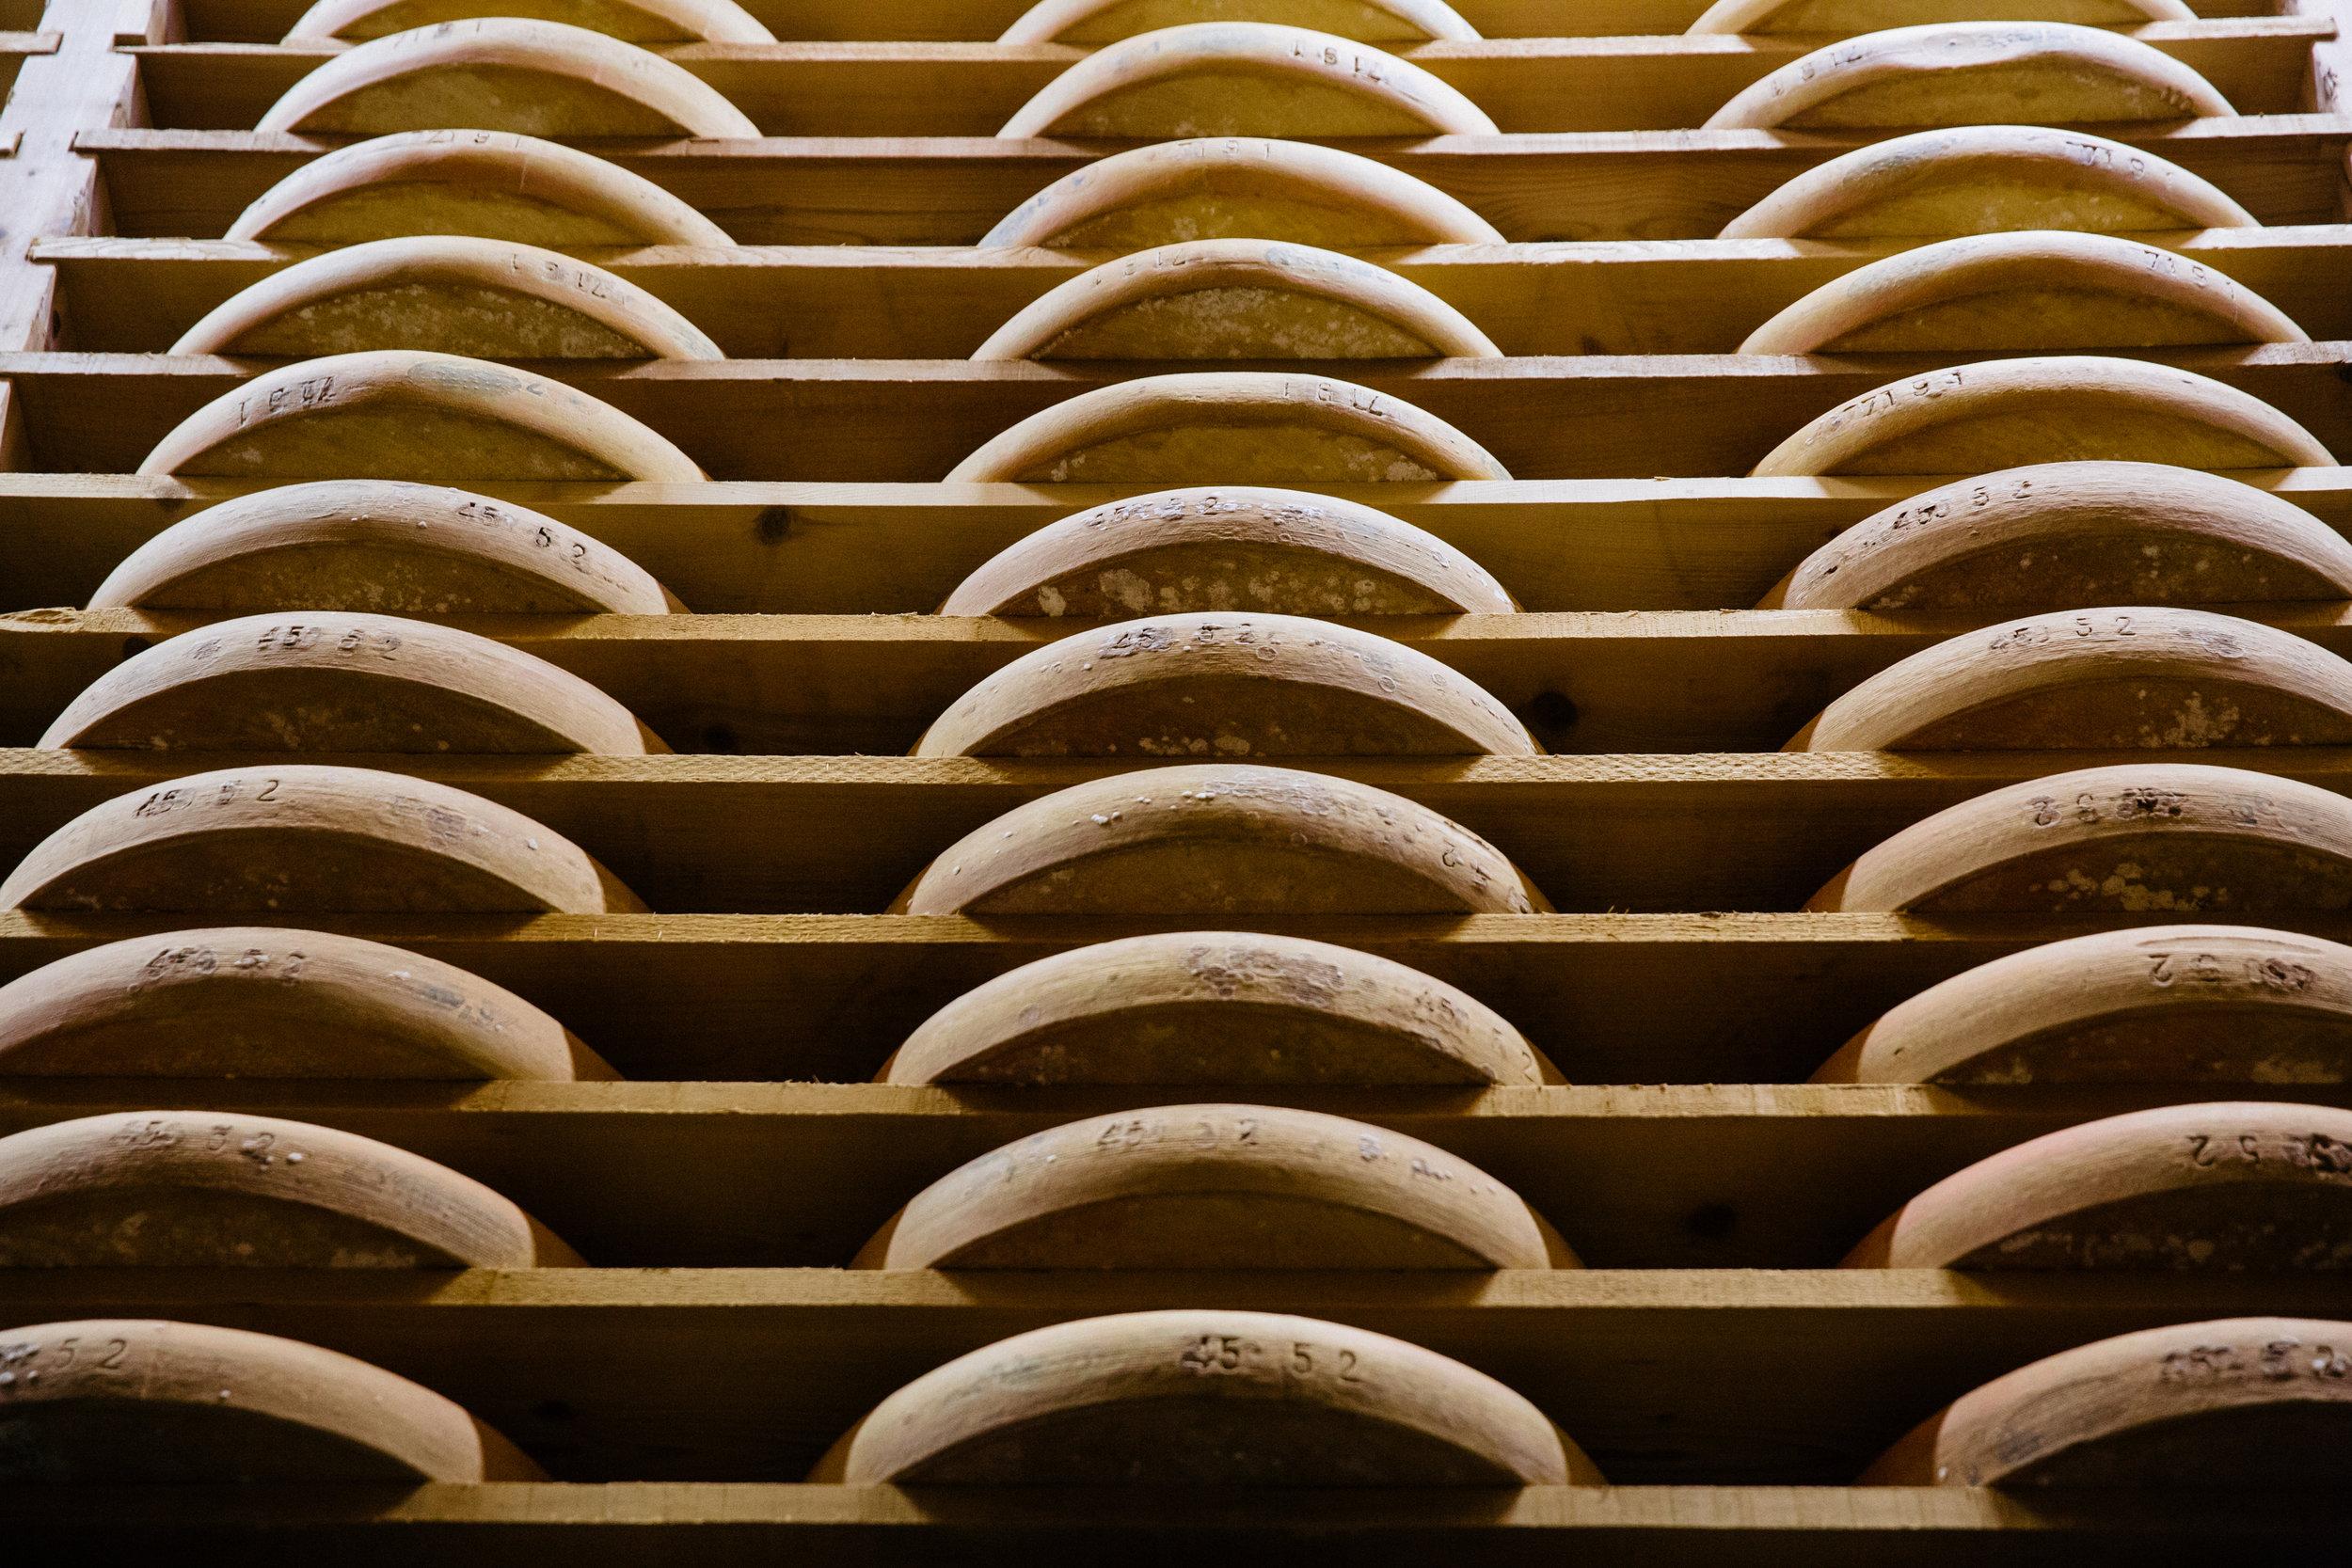 COMTé DETAILS - Chef du Cave Claude QuerrySelection Dominic Coyte and Jason HindsUnpasteurized cow's milkCow breed MontbéliardeSummer milk Comté sold April through JanuaryWinter milk Comté sold February through MarchWheels sold as 75 lbs whole, 18 lbs quarters, 9 lbs eighths